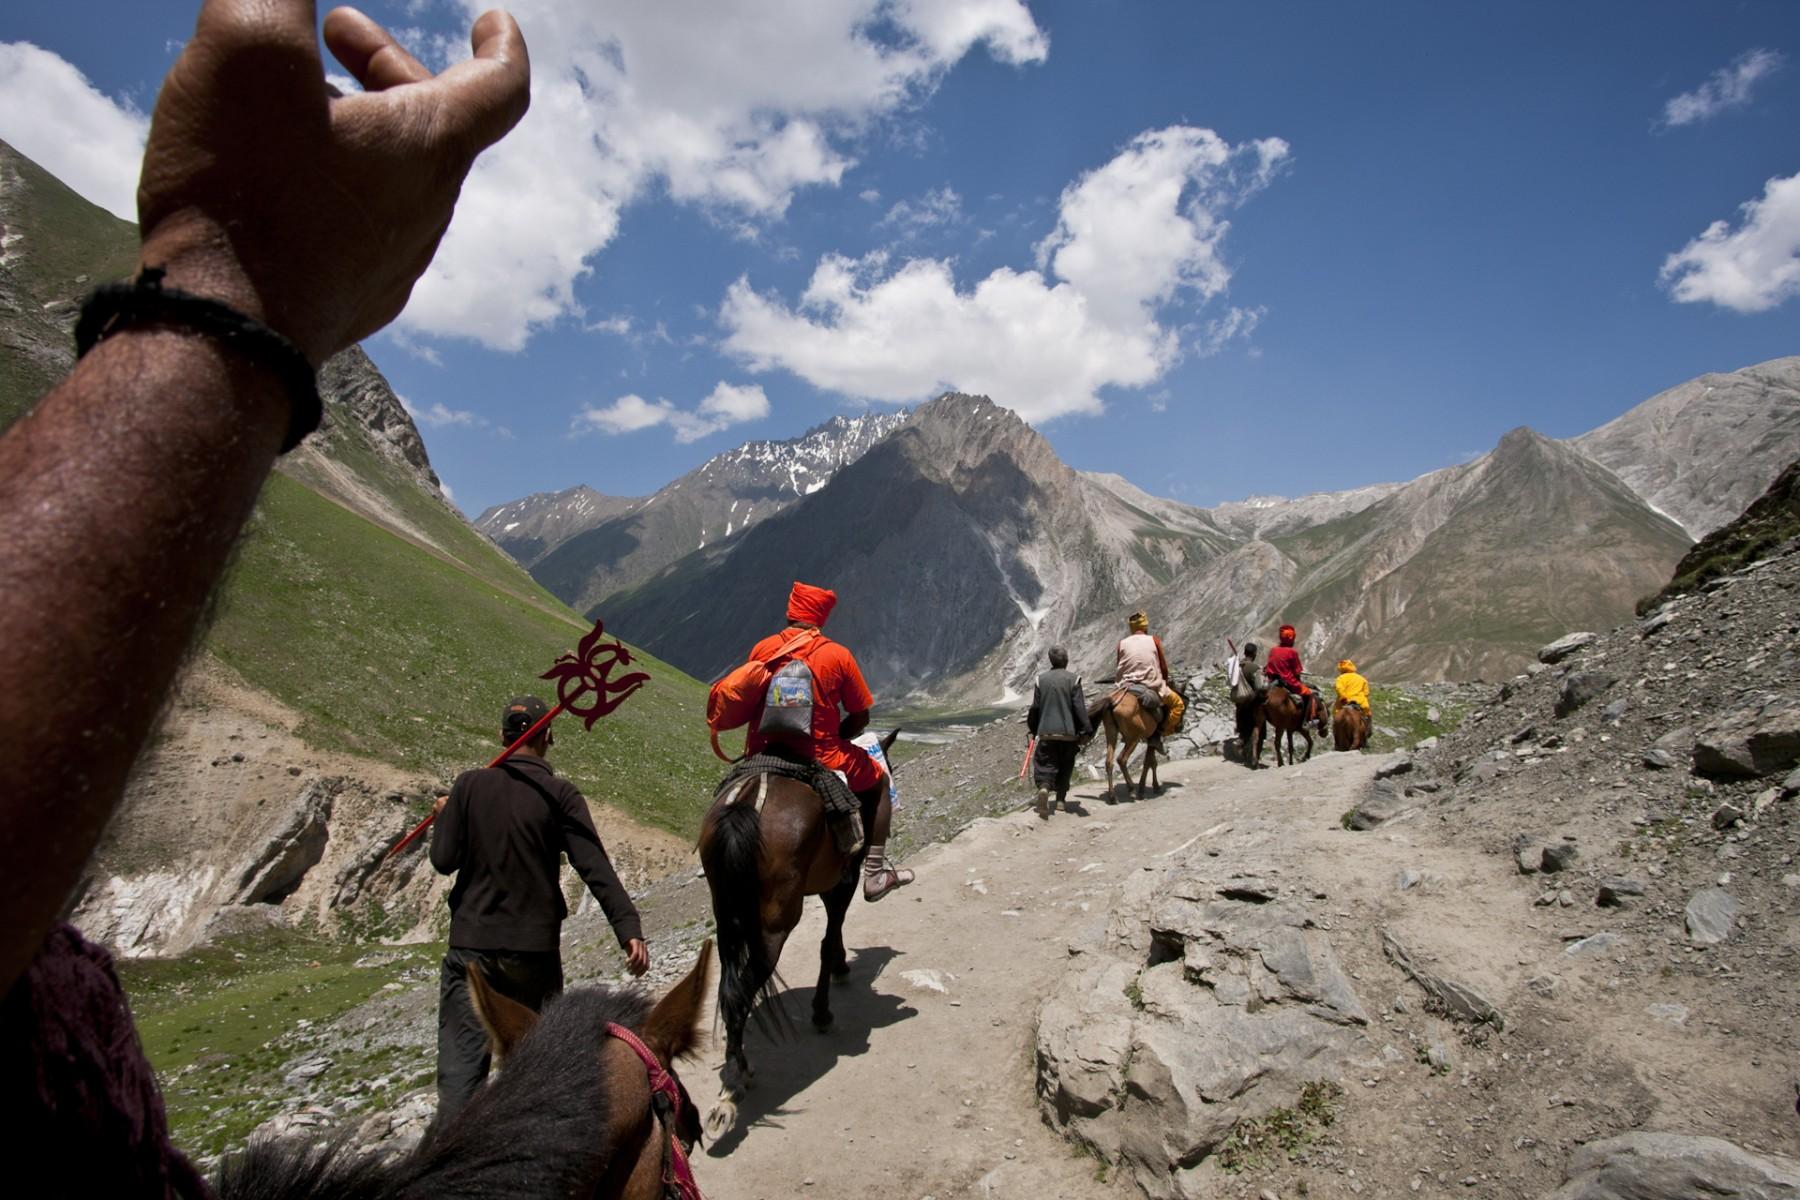 Pilgrims on ponies Armanath